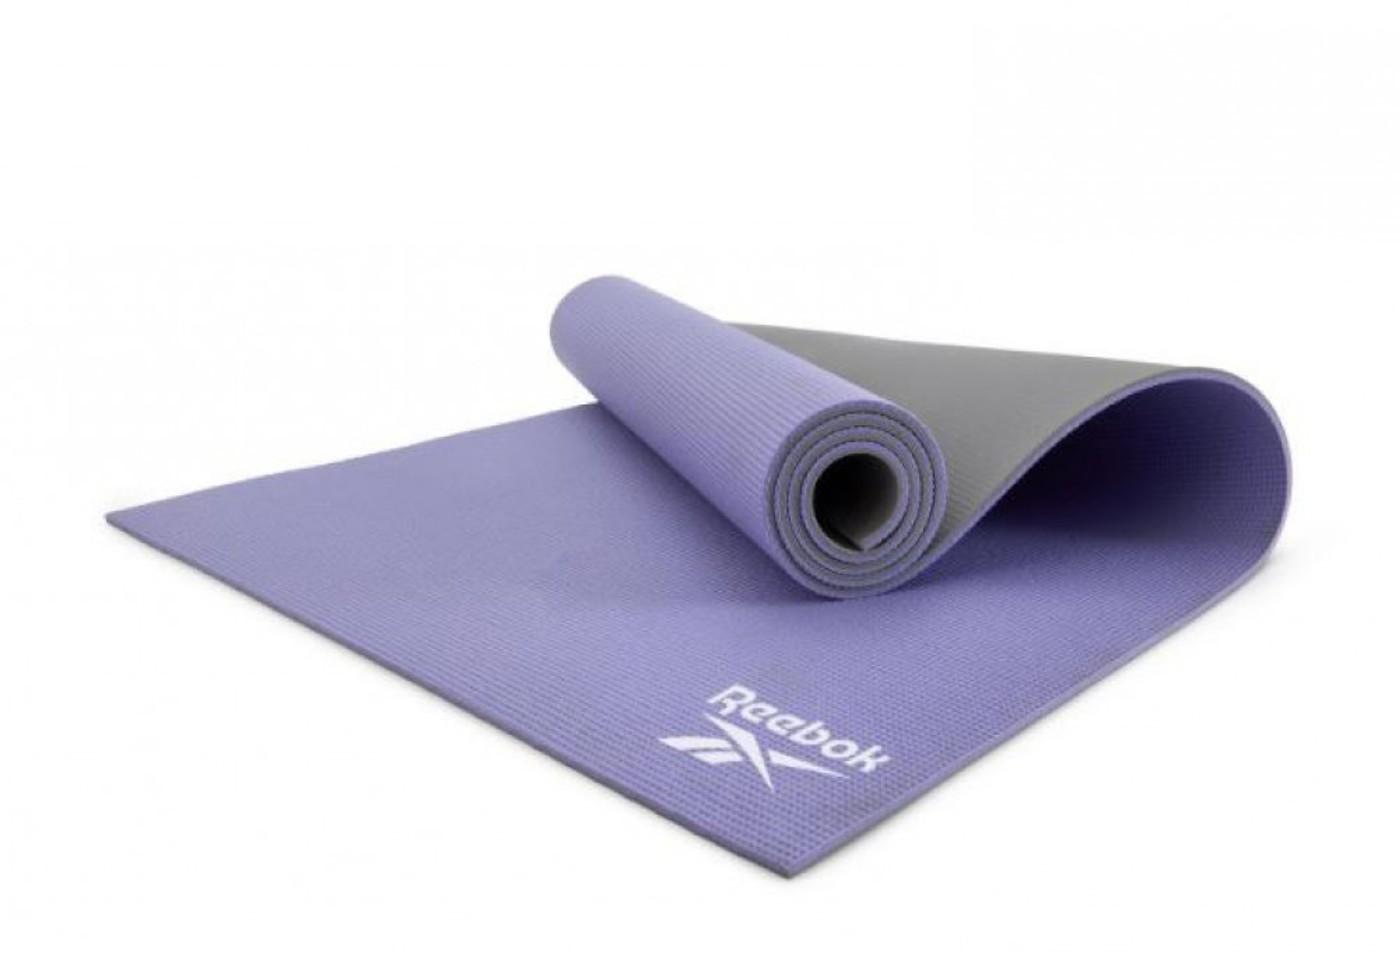 REEBOK Double Sided 6mm Yoga Mat -